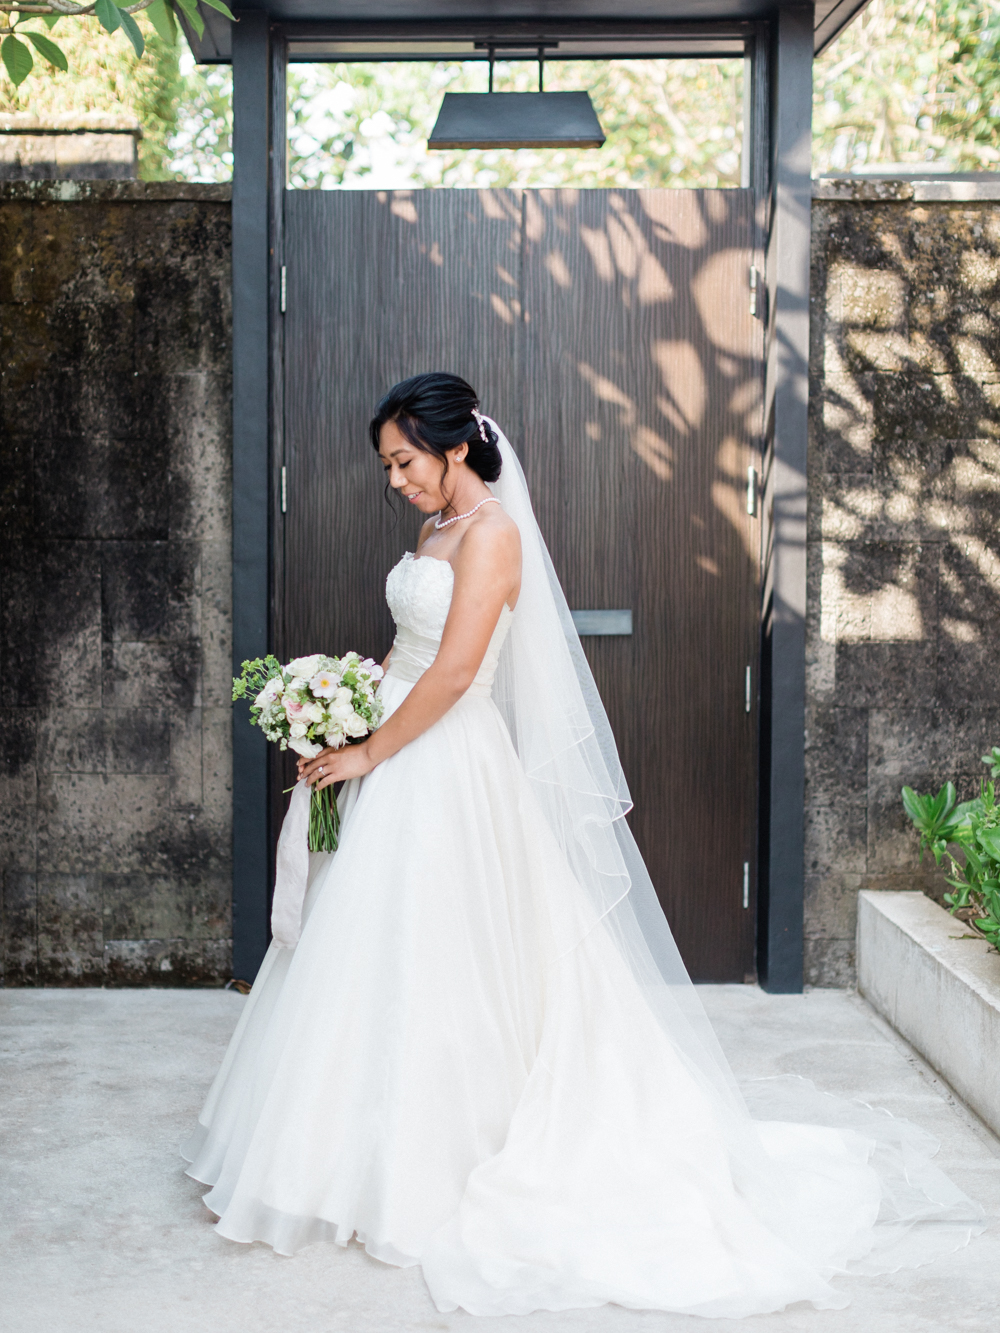 Bali_Real_Wedding_(c)_Rory_Wylie-47.jpg